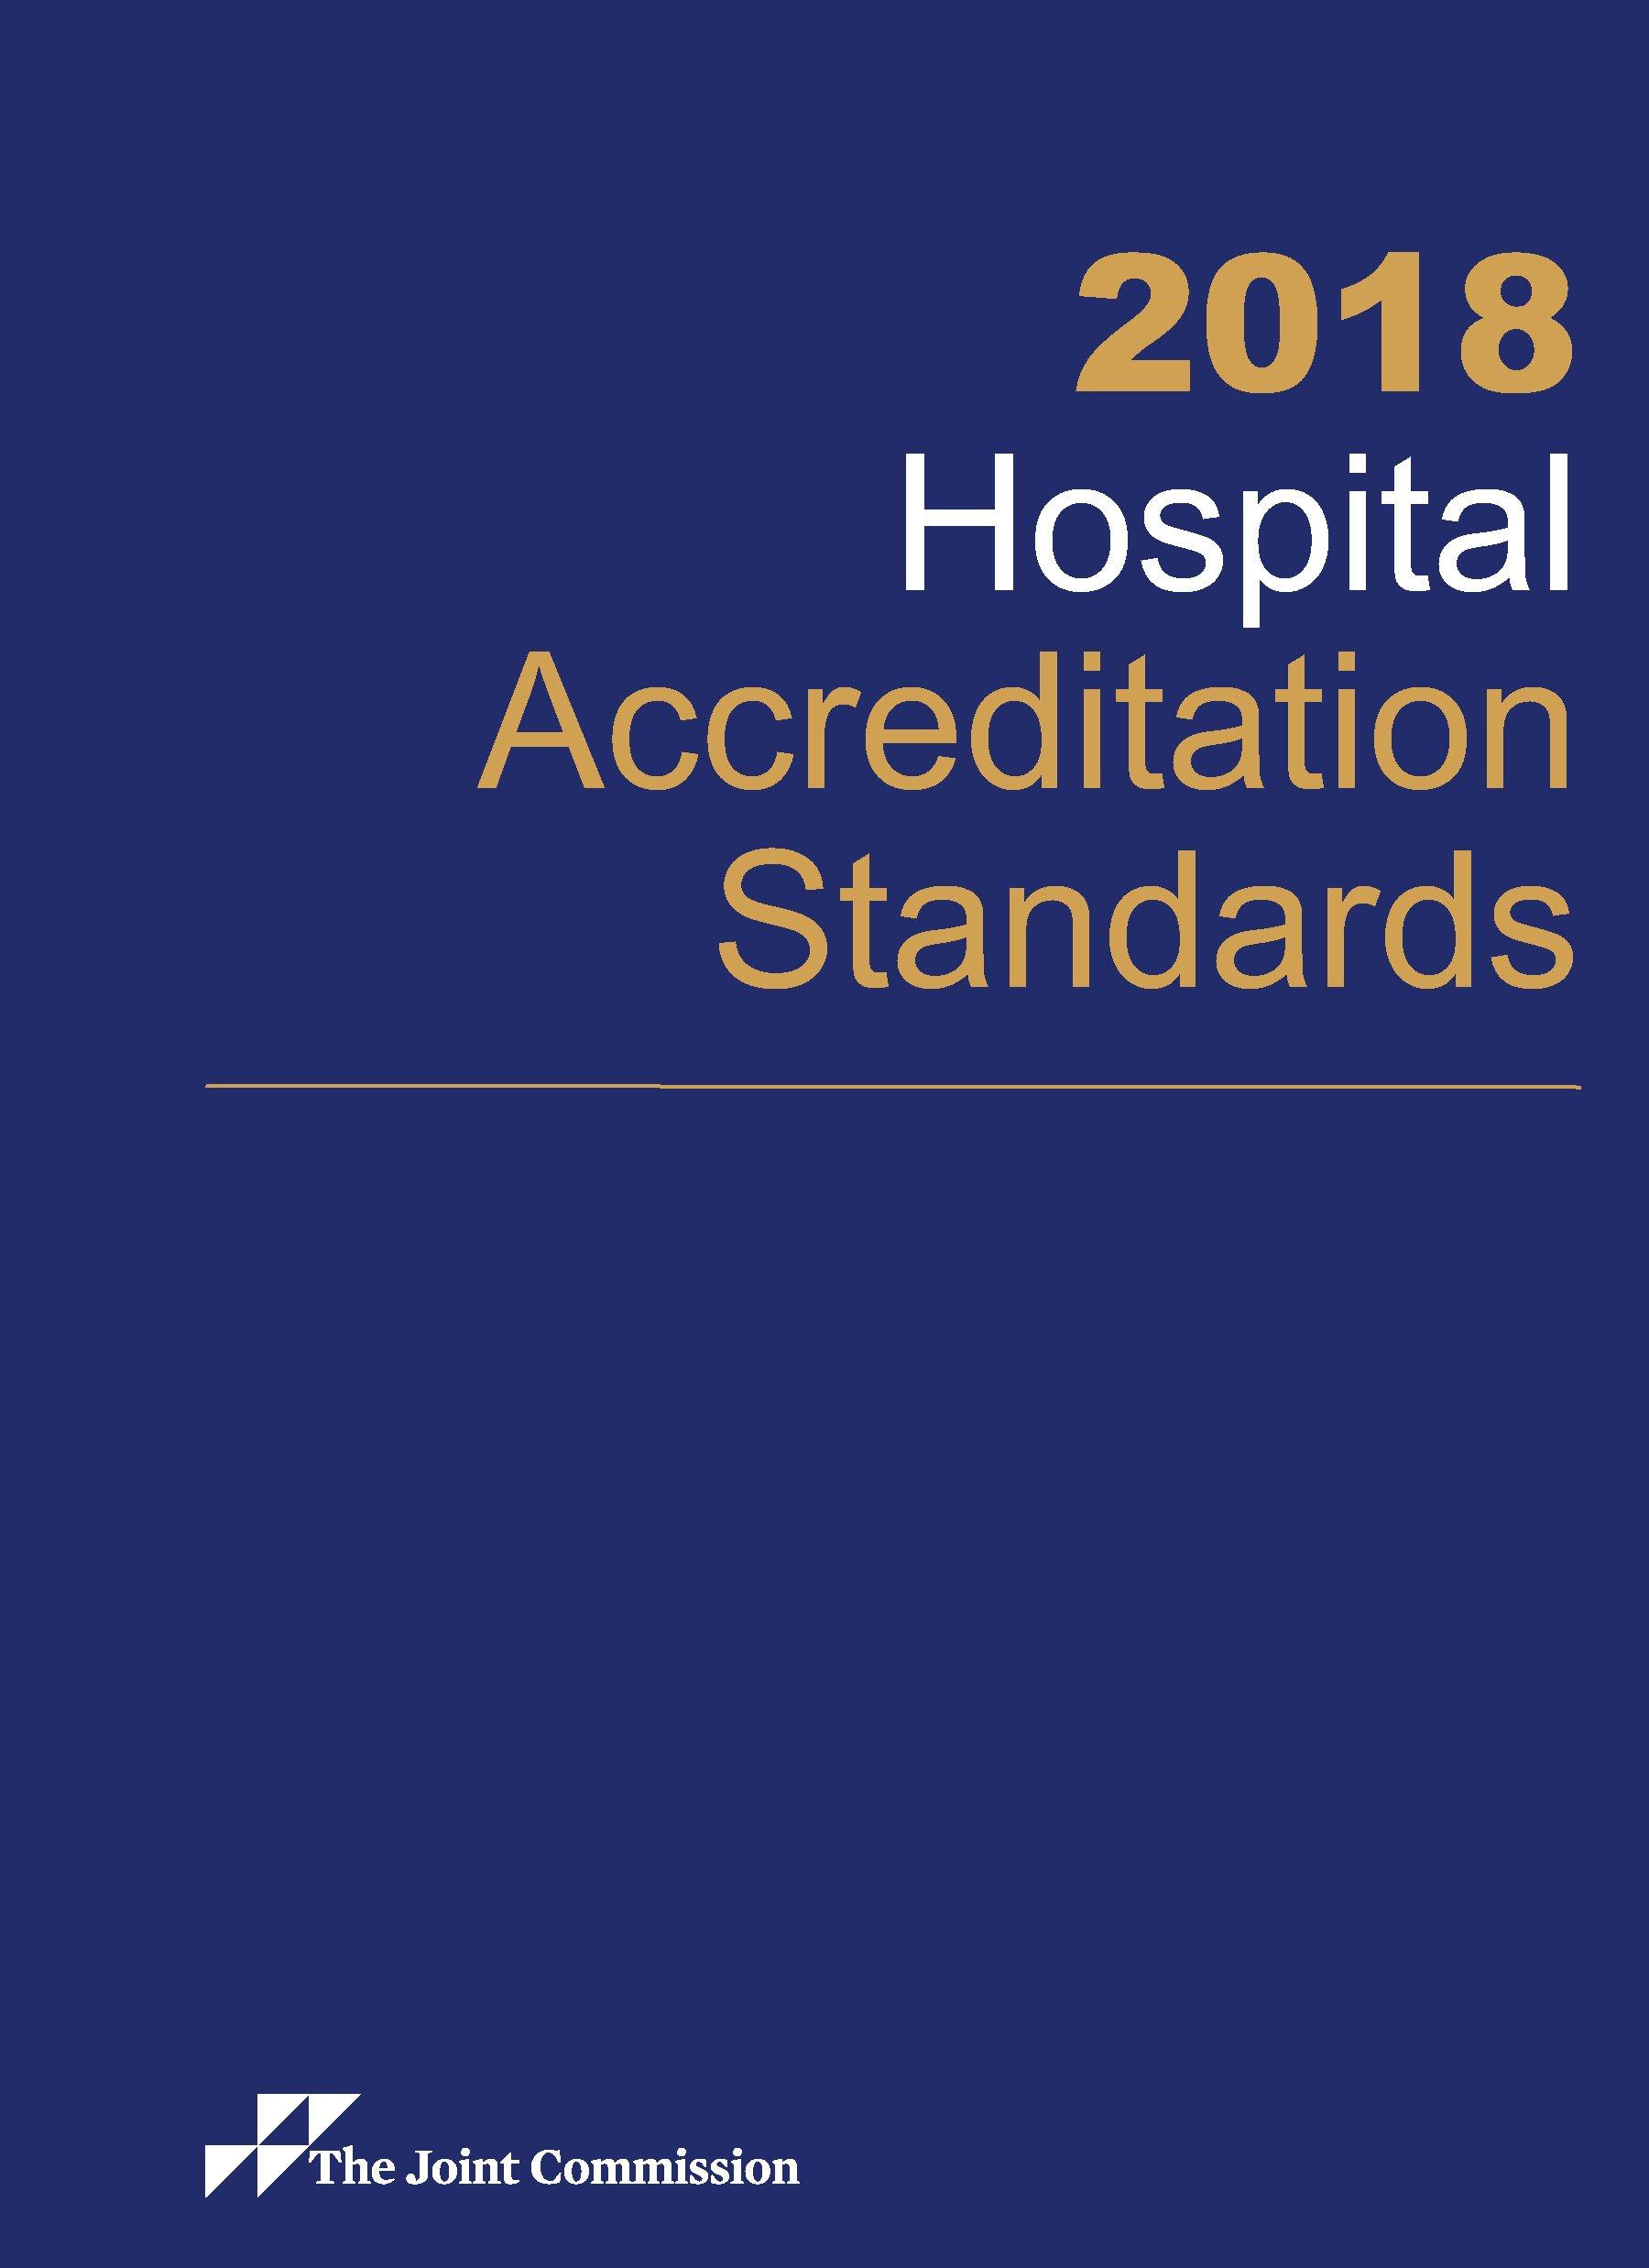 2018 Hospital Accreditation Standards